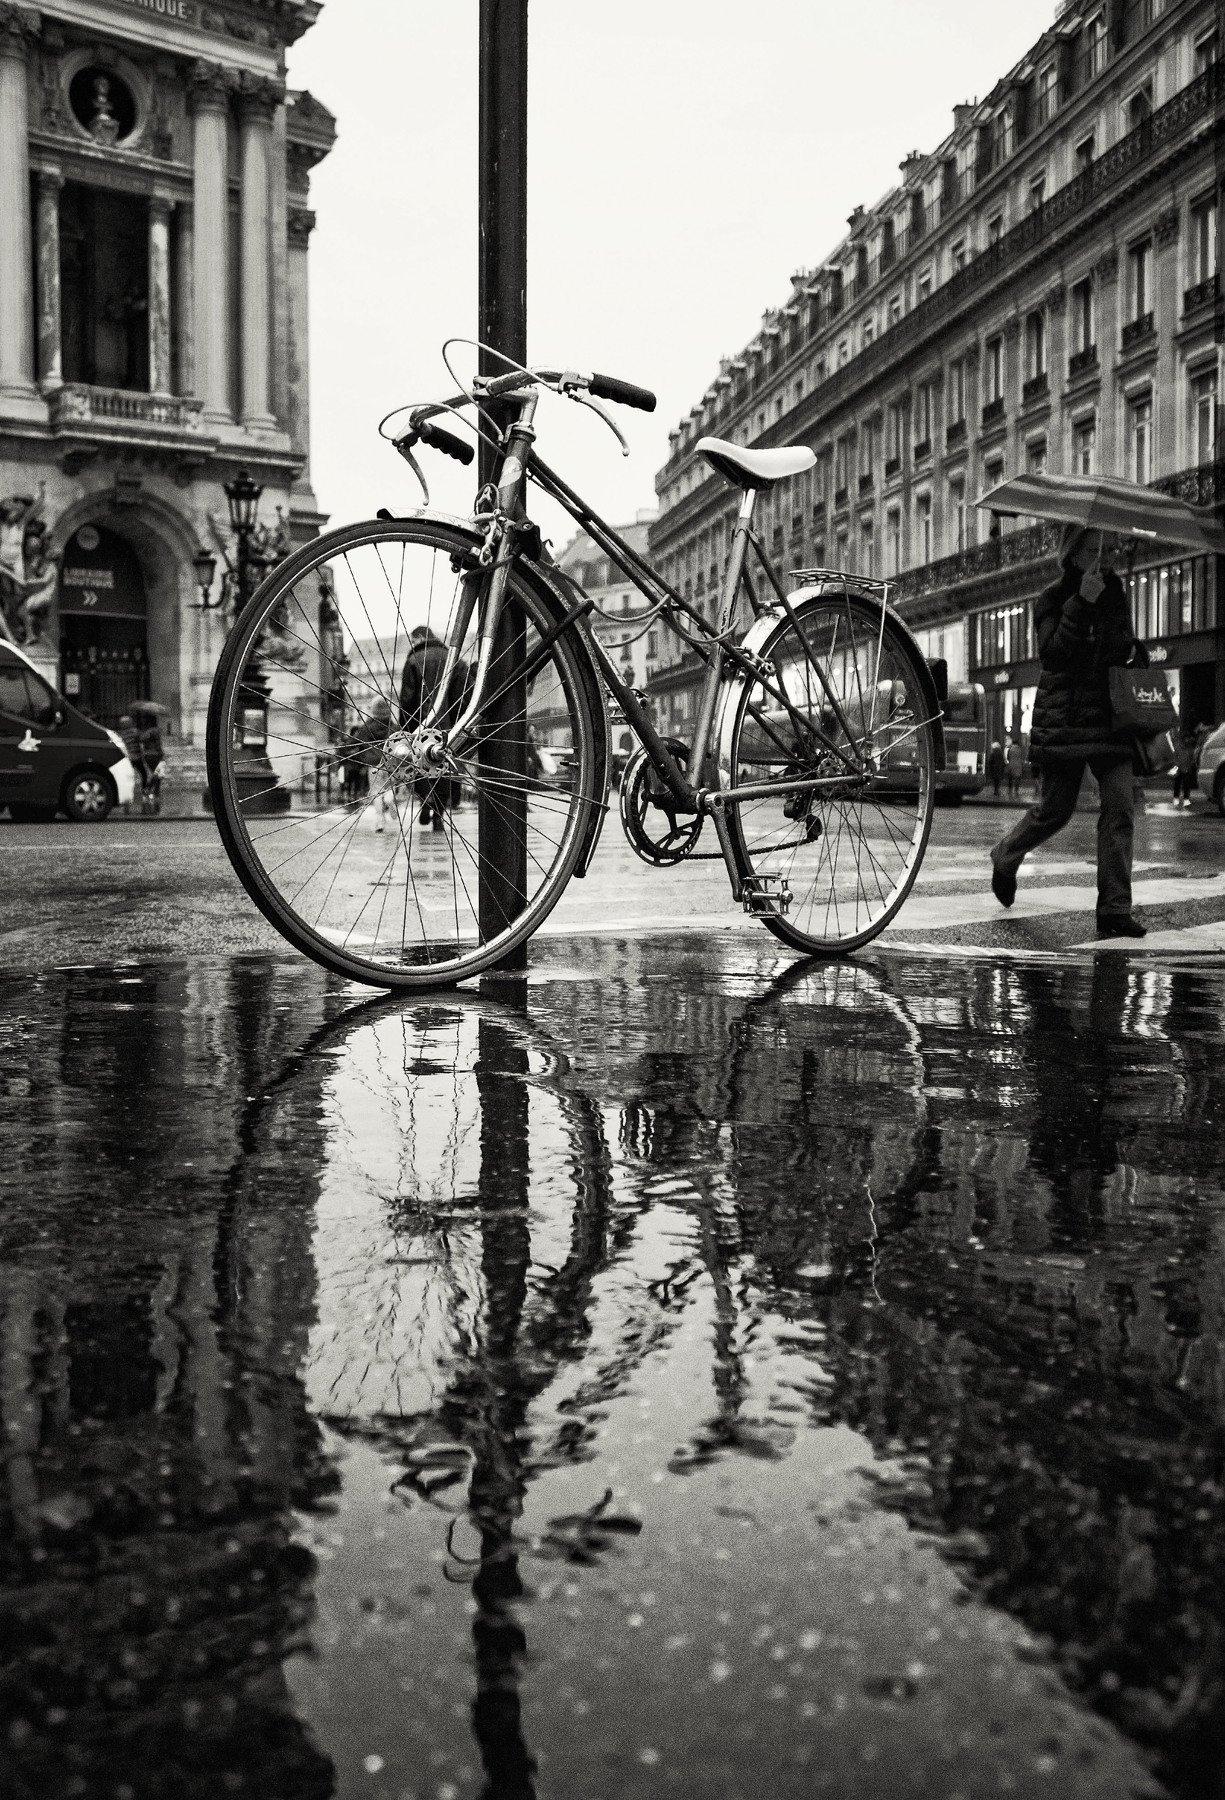 paris, cycle, rain, umbrella, puddle, reflex, france, париж, дождь, отражение, франция, зонт, лужа, Егор Бугримов